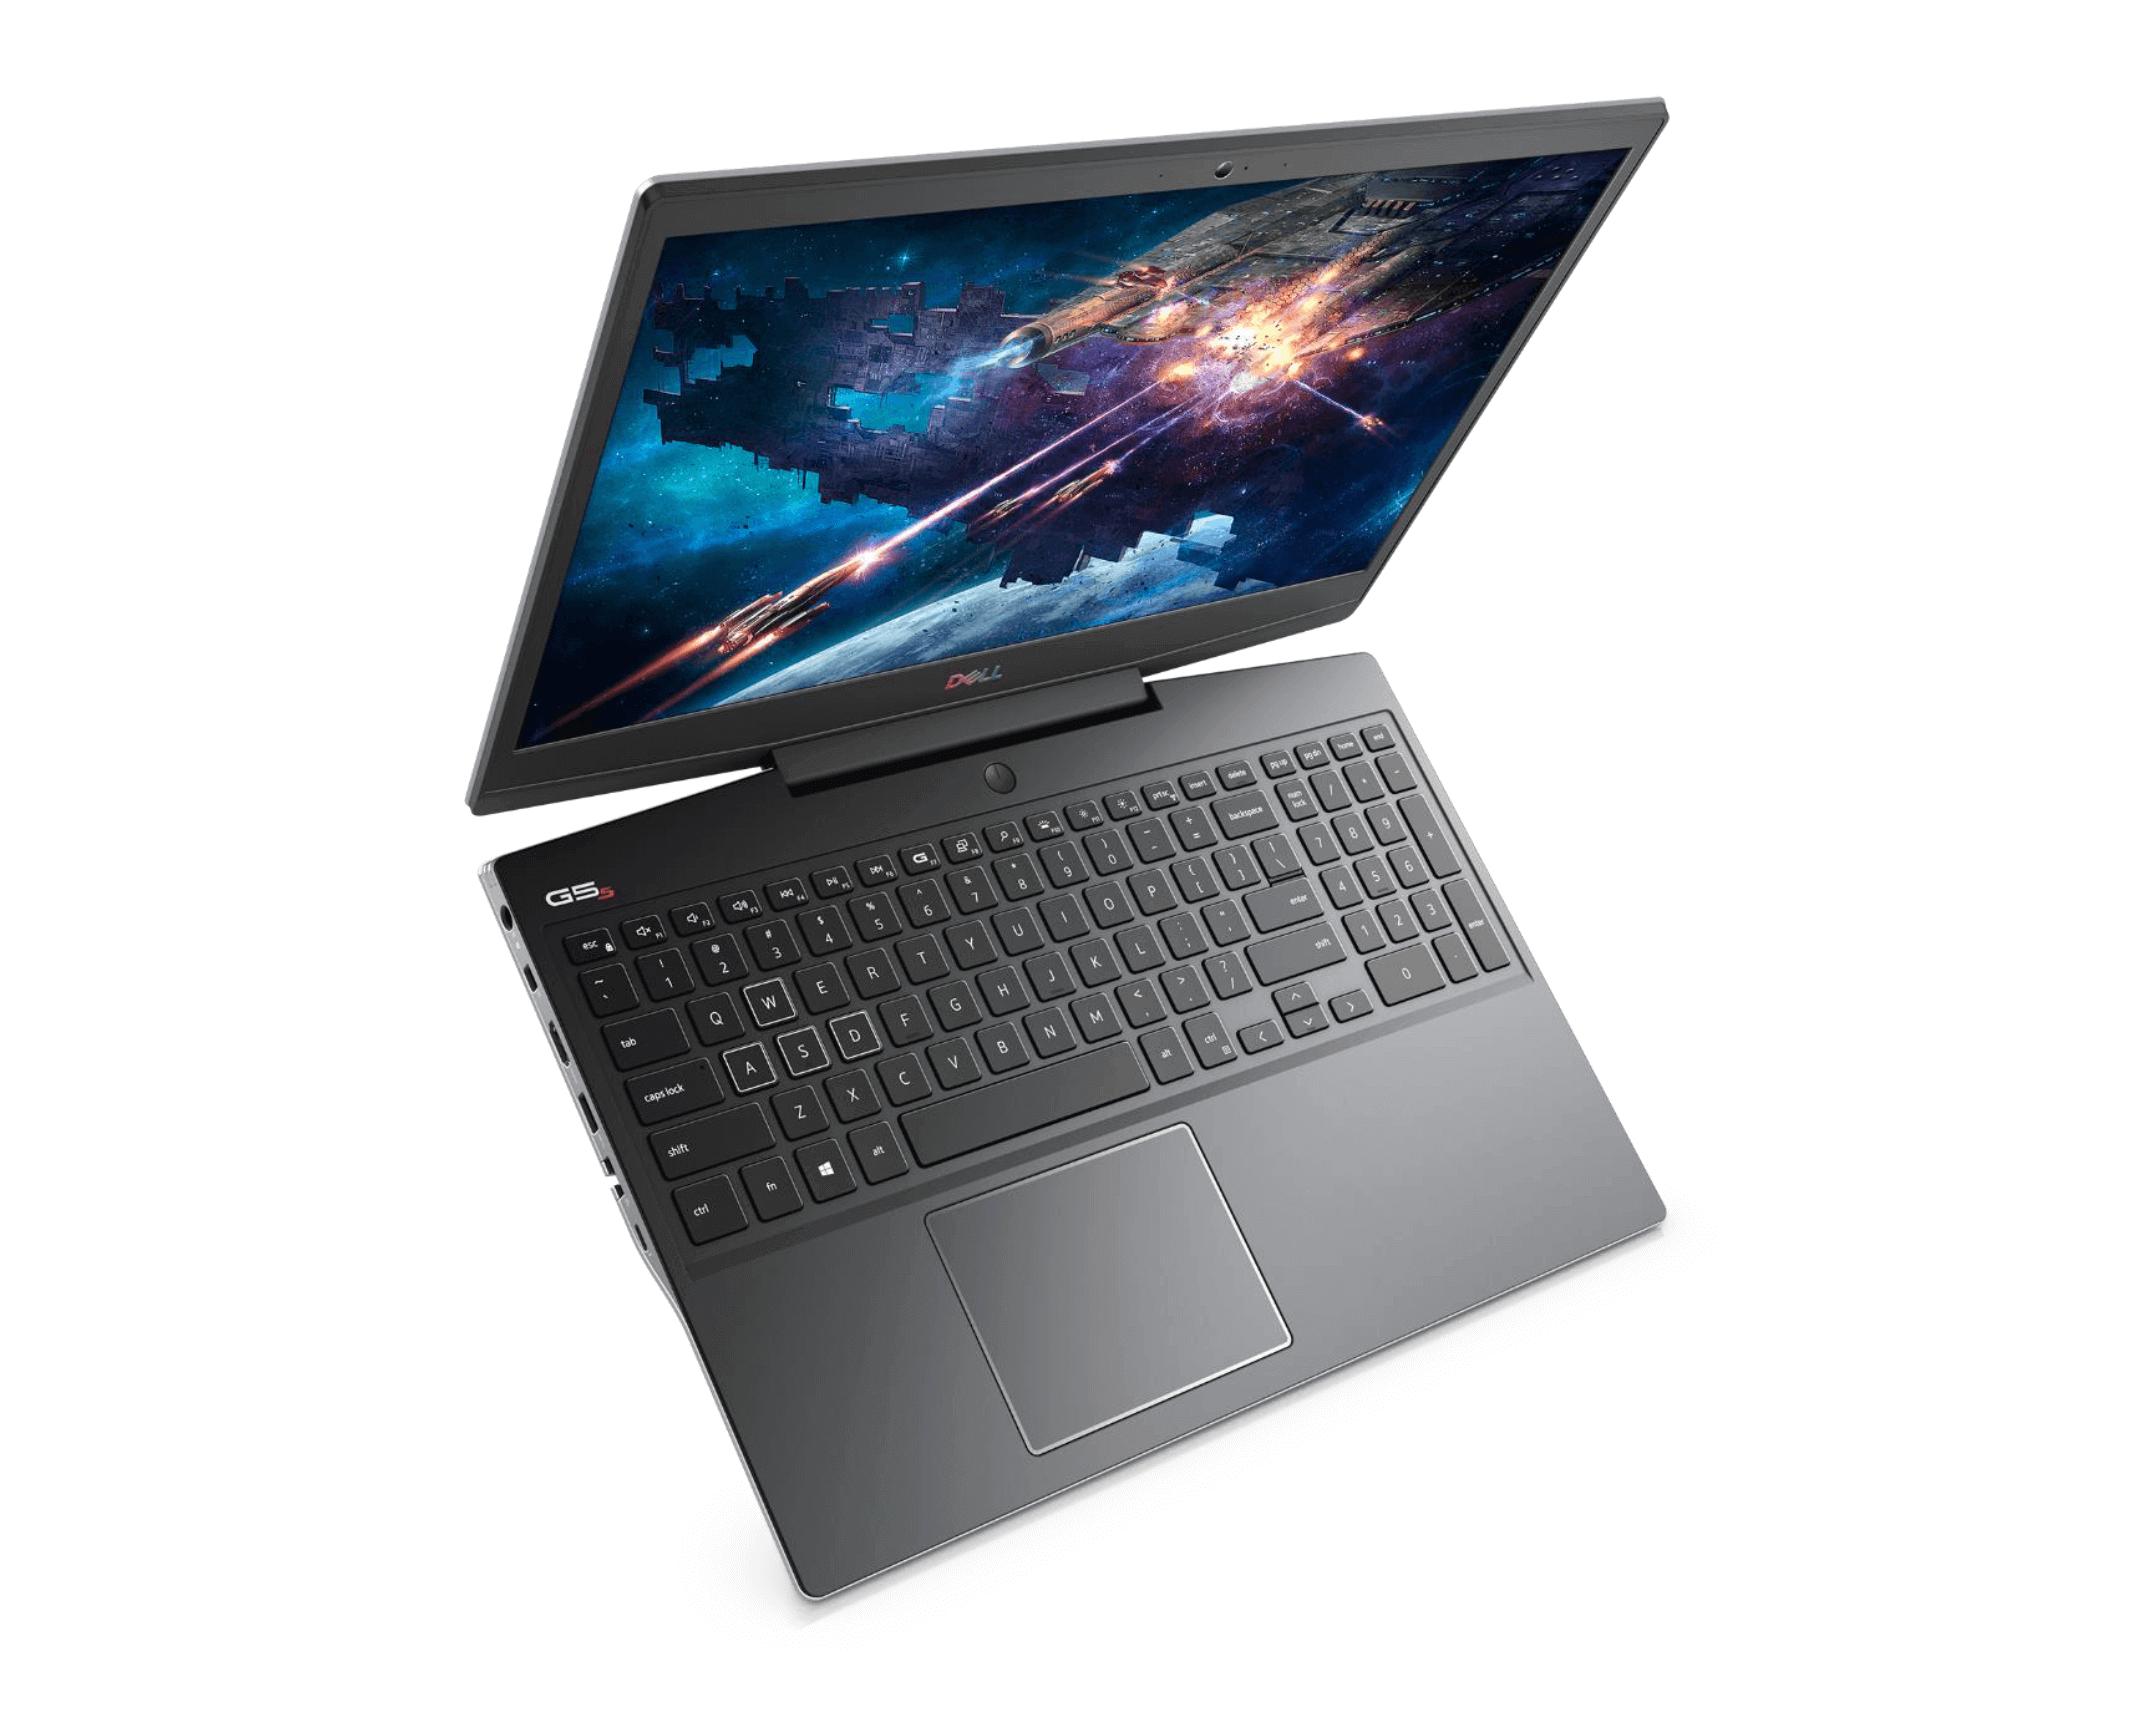 Dell G5 15 SE AMD Ryzen 4000 CPU AMD Radeon RX GPU Notebook 2